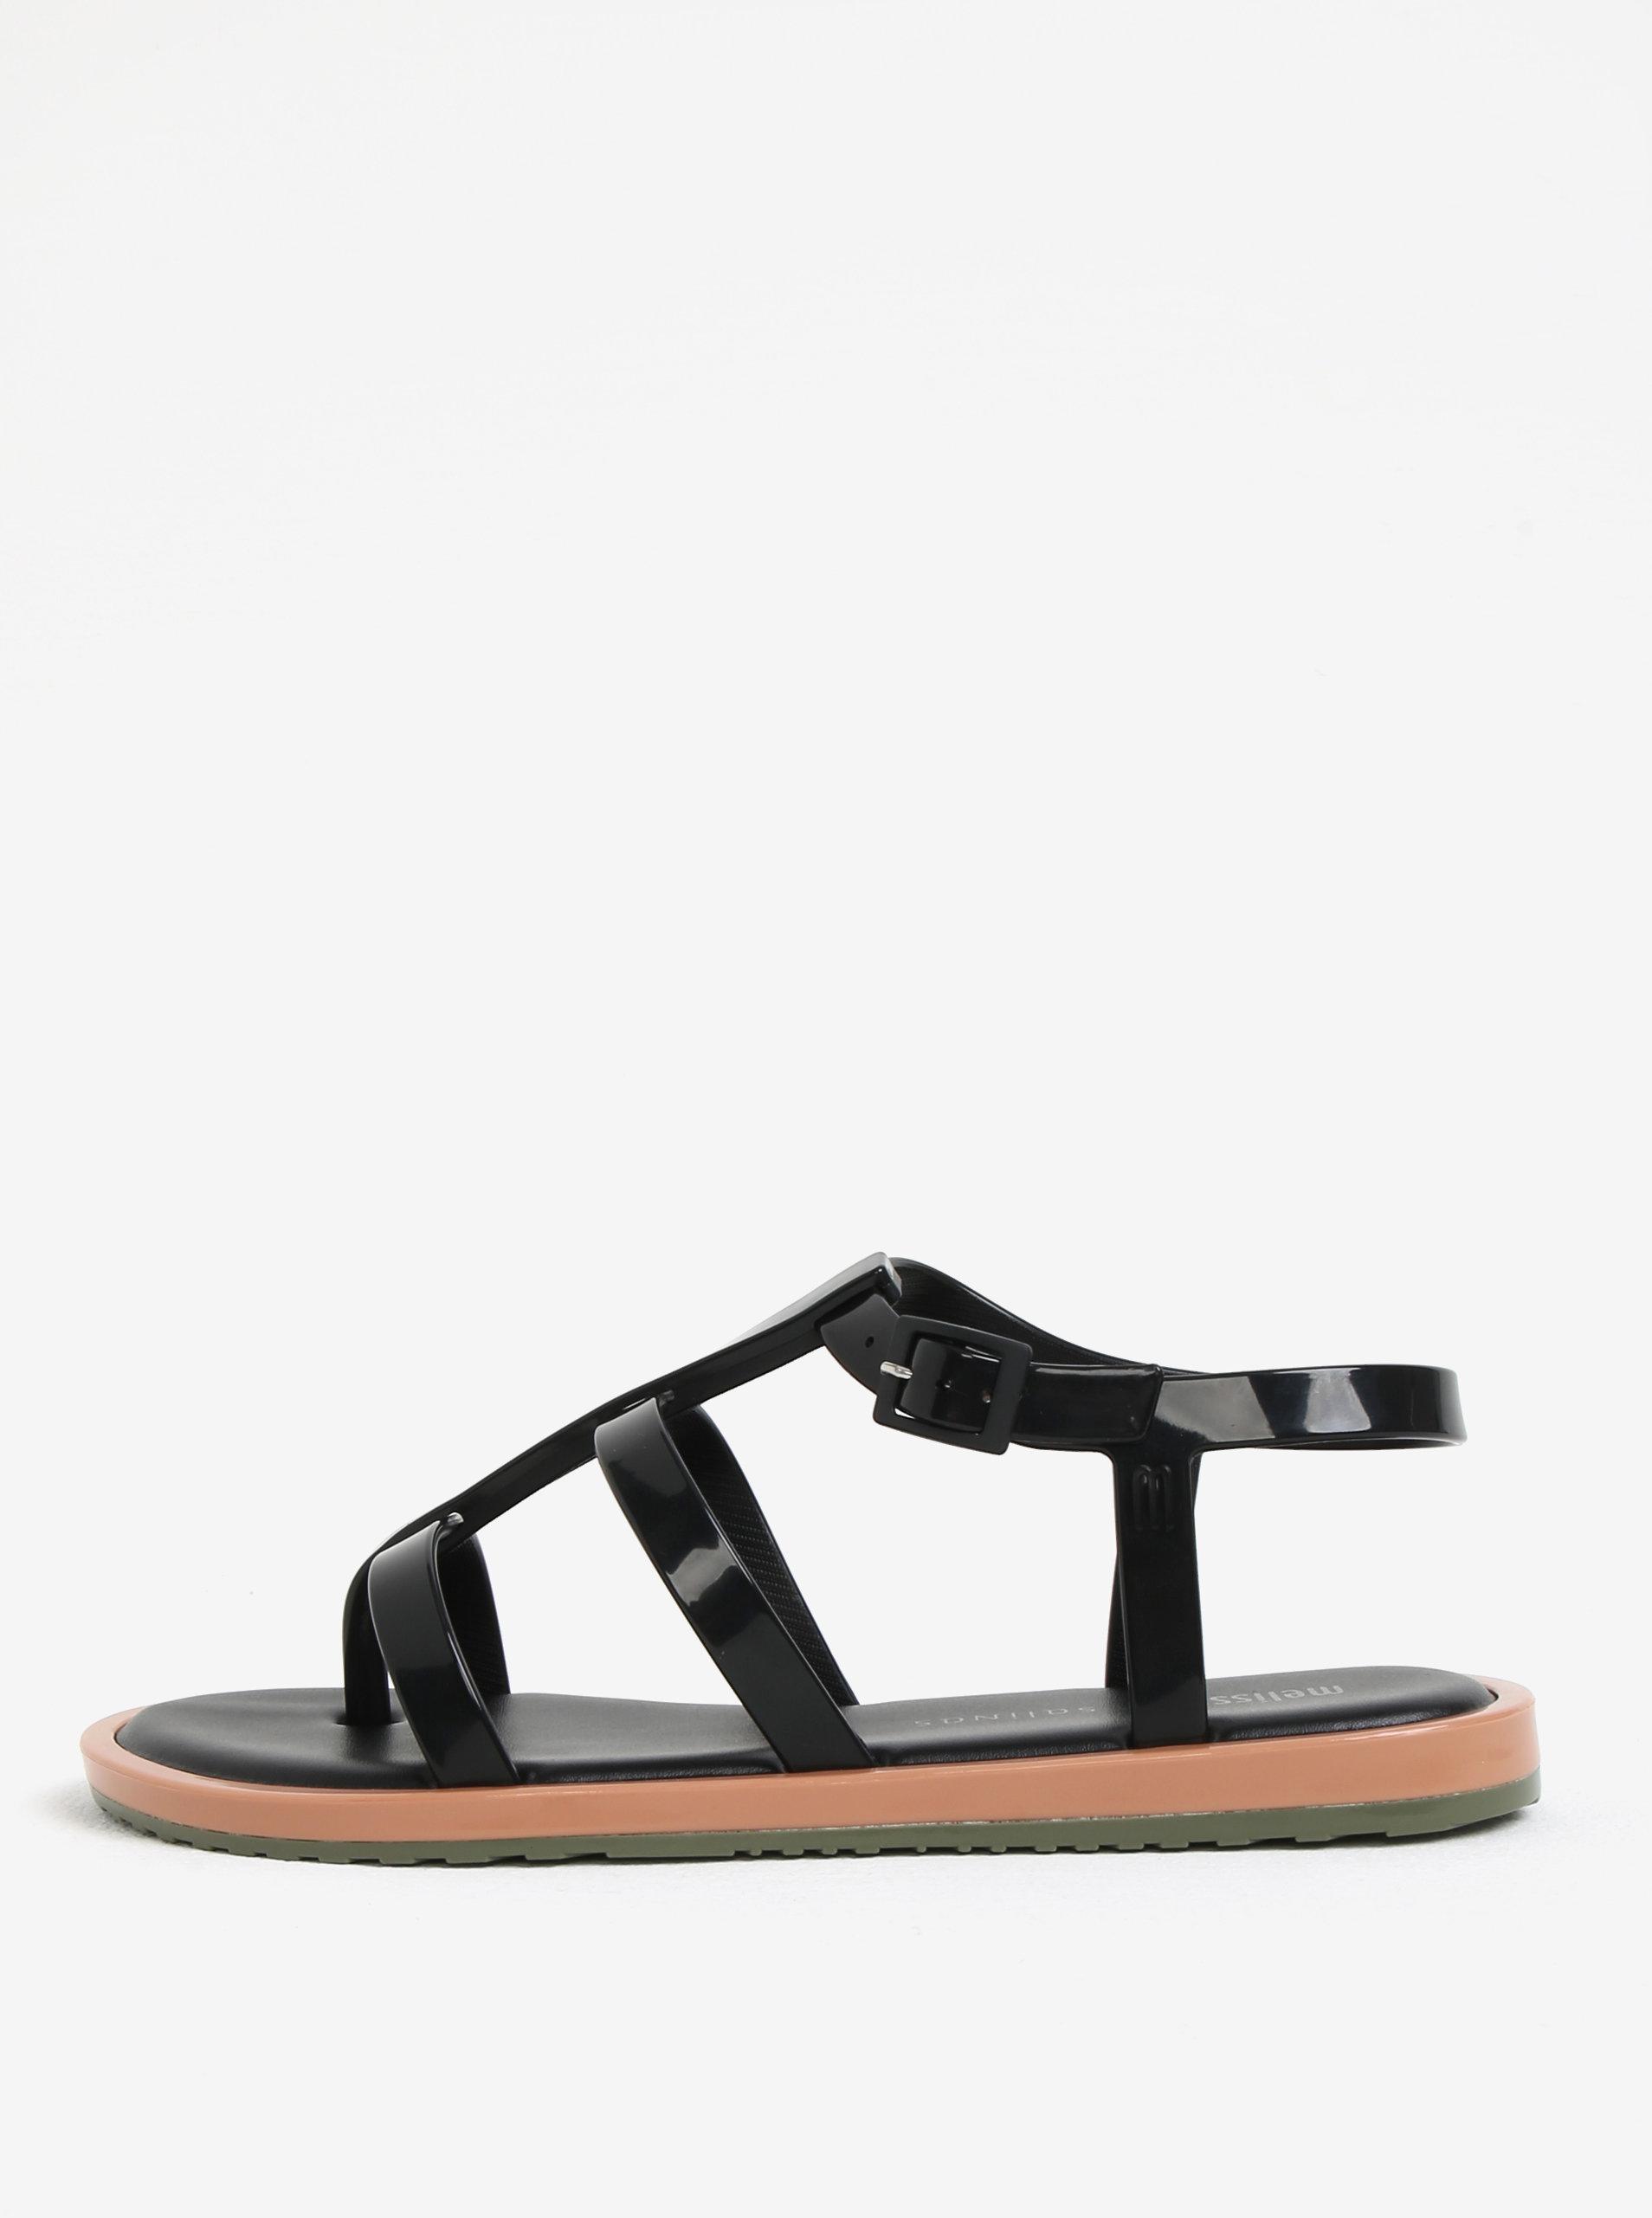 b2c07f7d079 Černé páskové sandály Melissa Caribe Verao ...